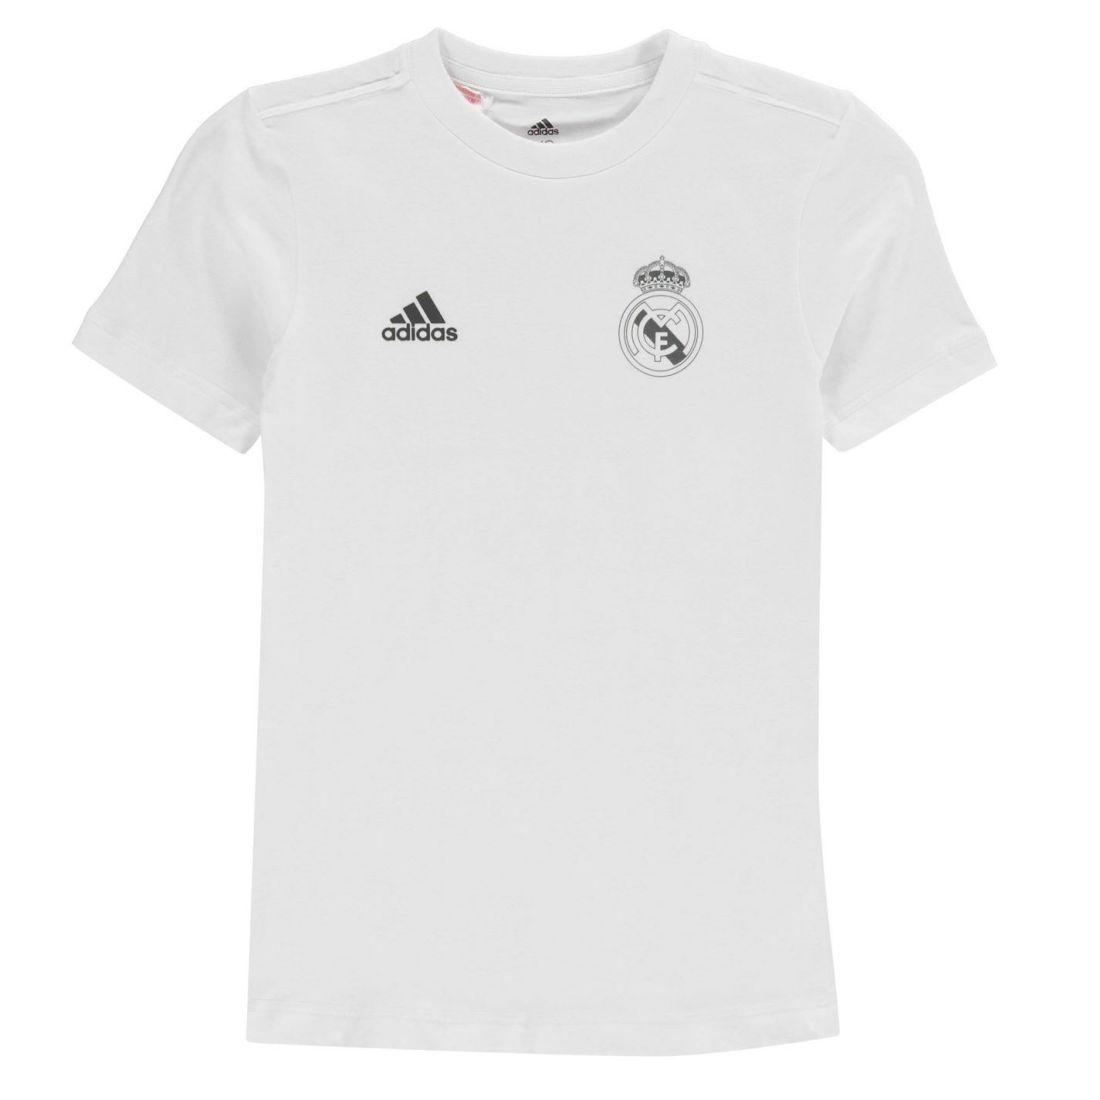 e0a3a5a5 adidas Kids Boys Real Basic T Shirt Junior Short Sleeve Performance ...